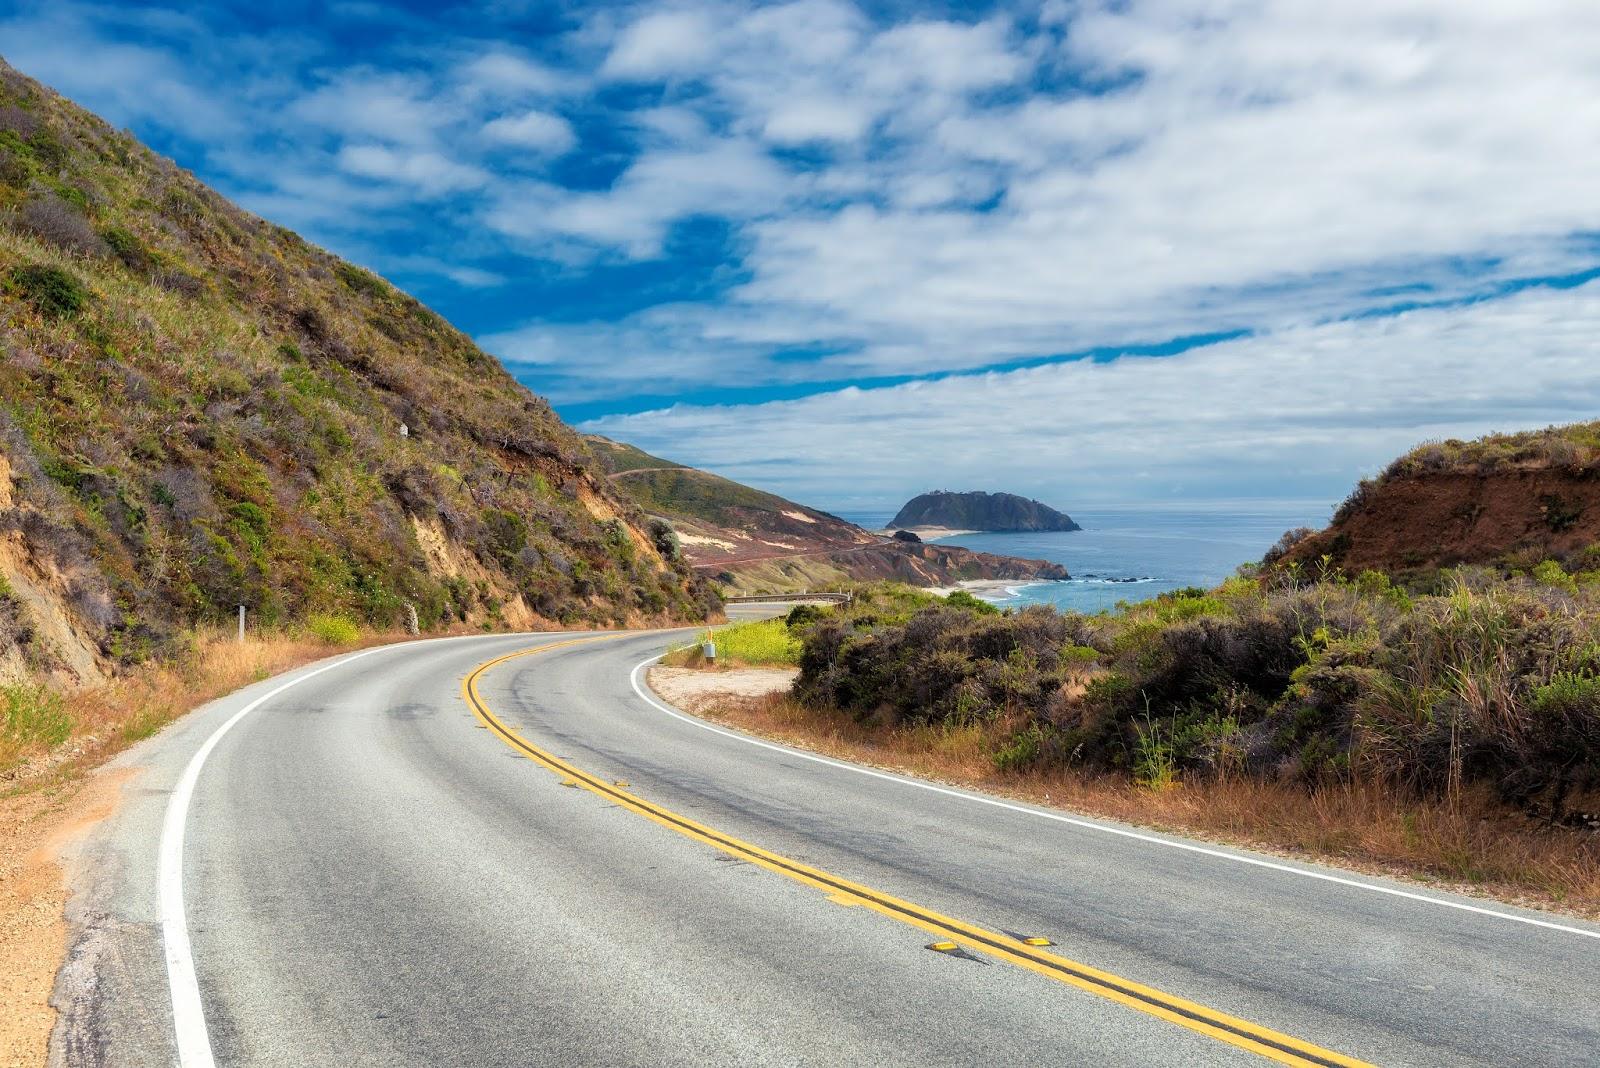 West: Pacific Coast Highway